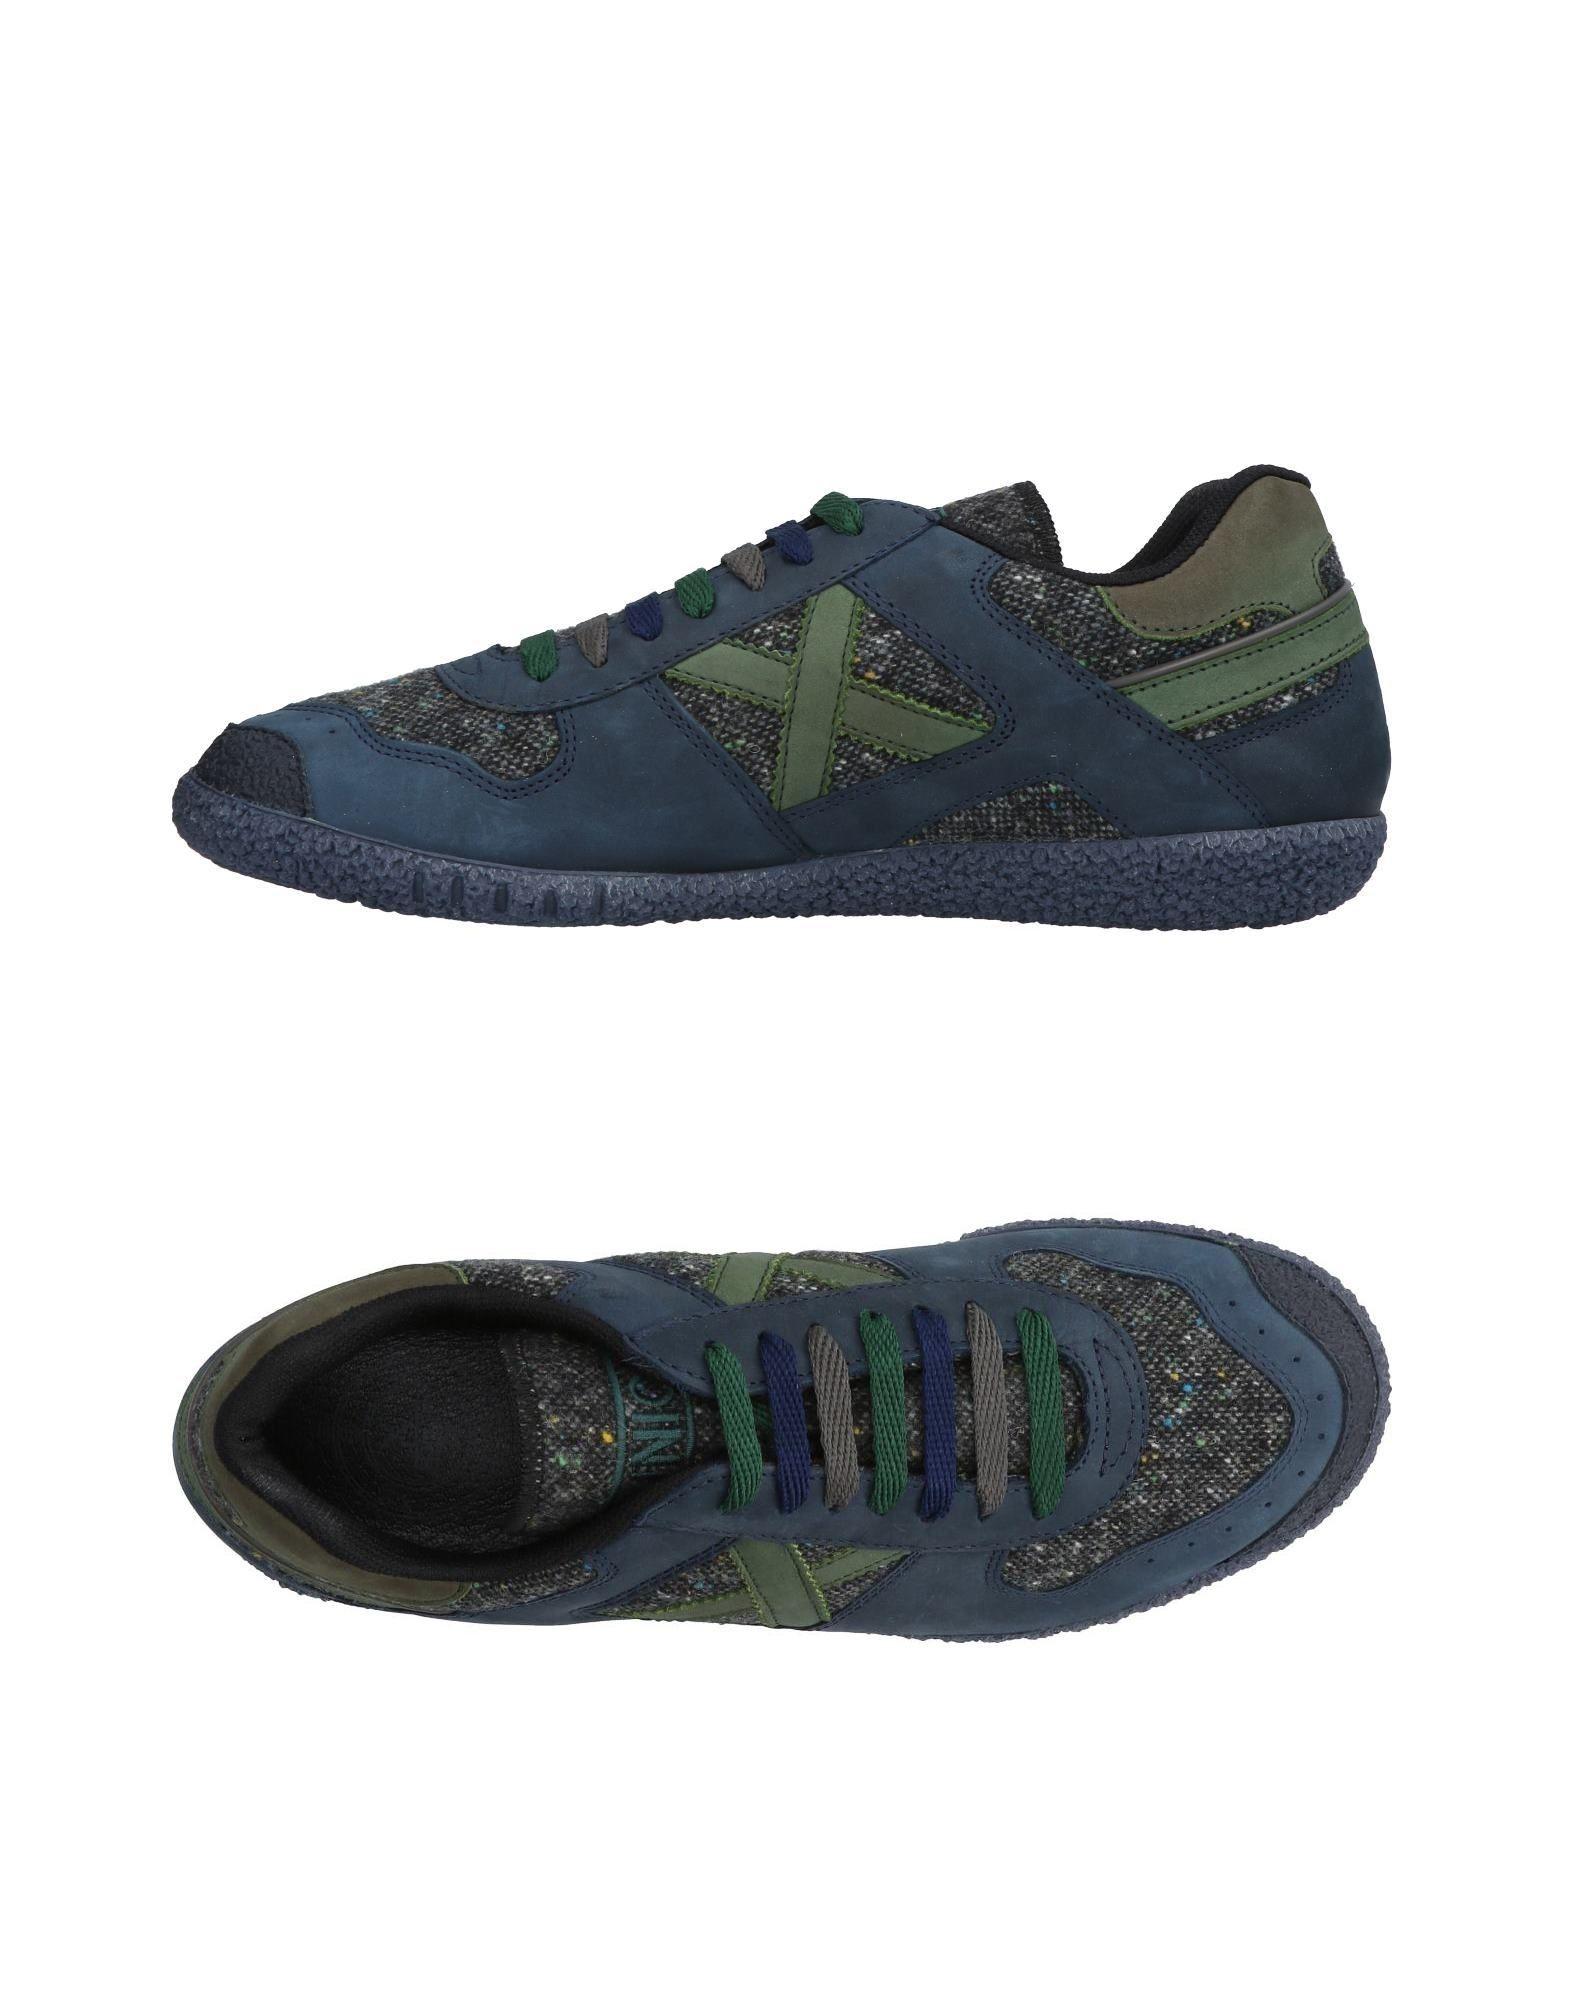 Moda Sneakers Munich Uomo - - Uomo 11412682WL 2d166f